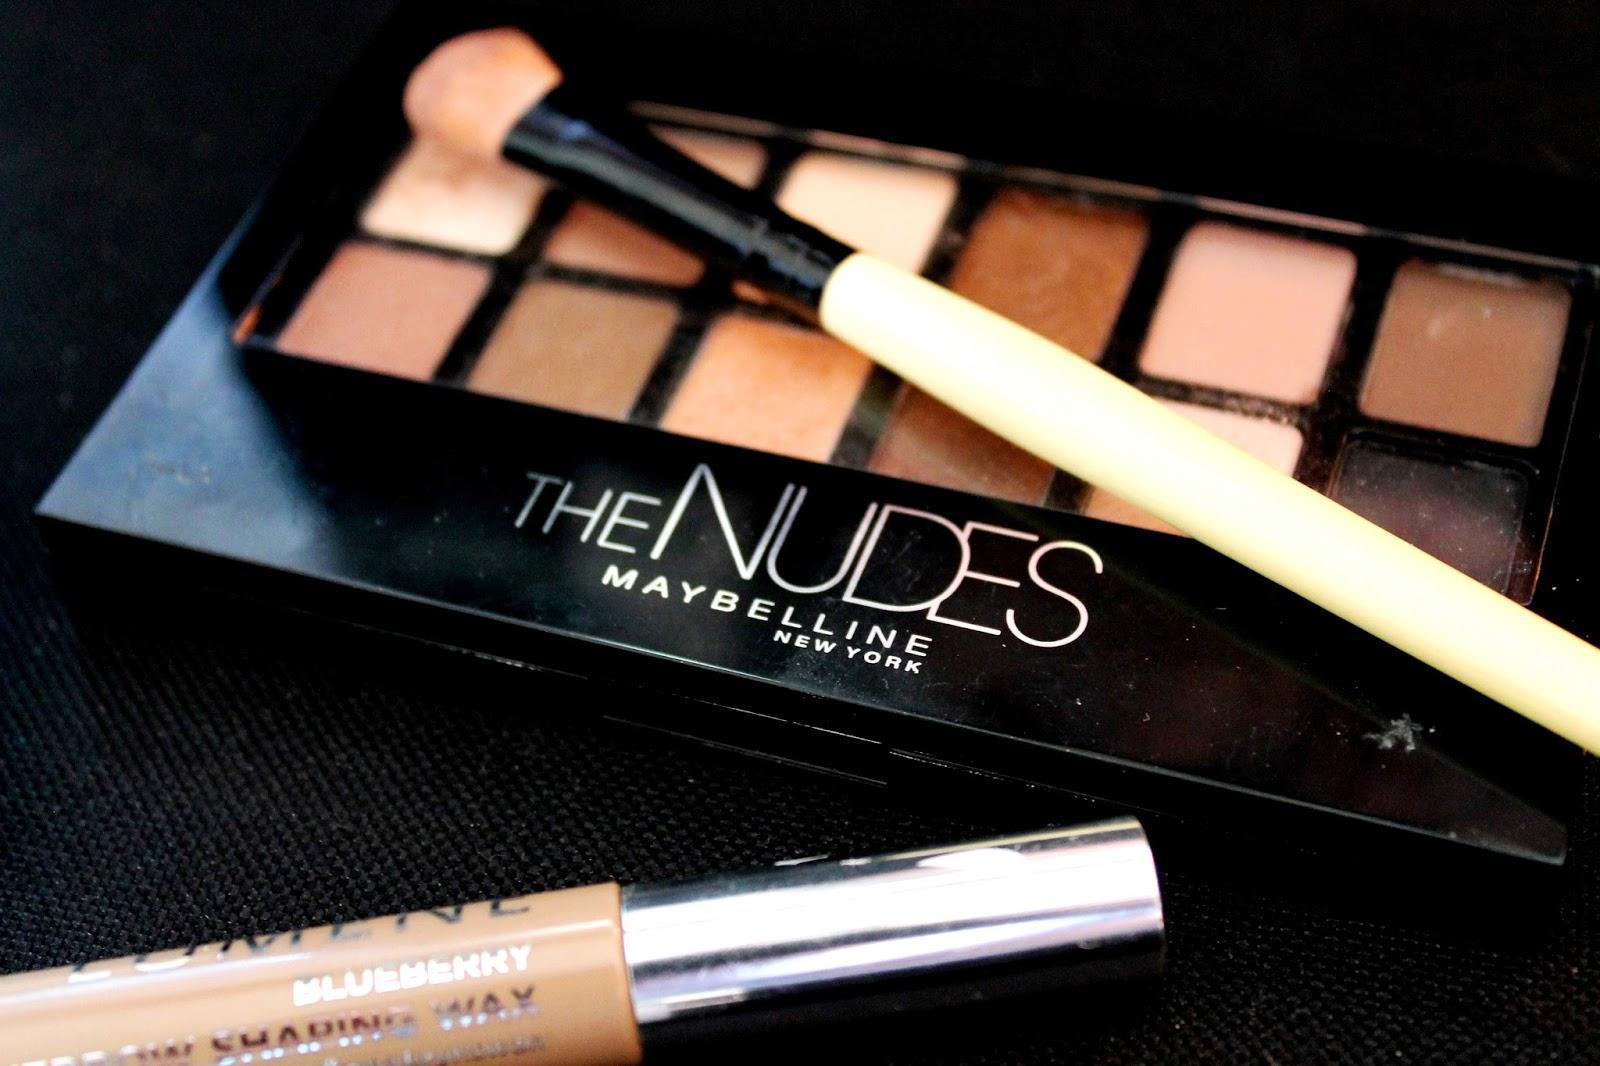 #eyeshadow #maybelline #thenudes #nude #nudes #lumene #cosmetics